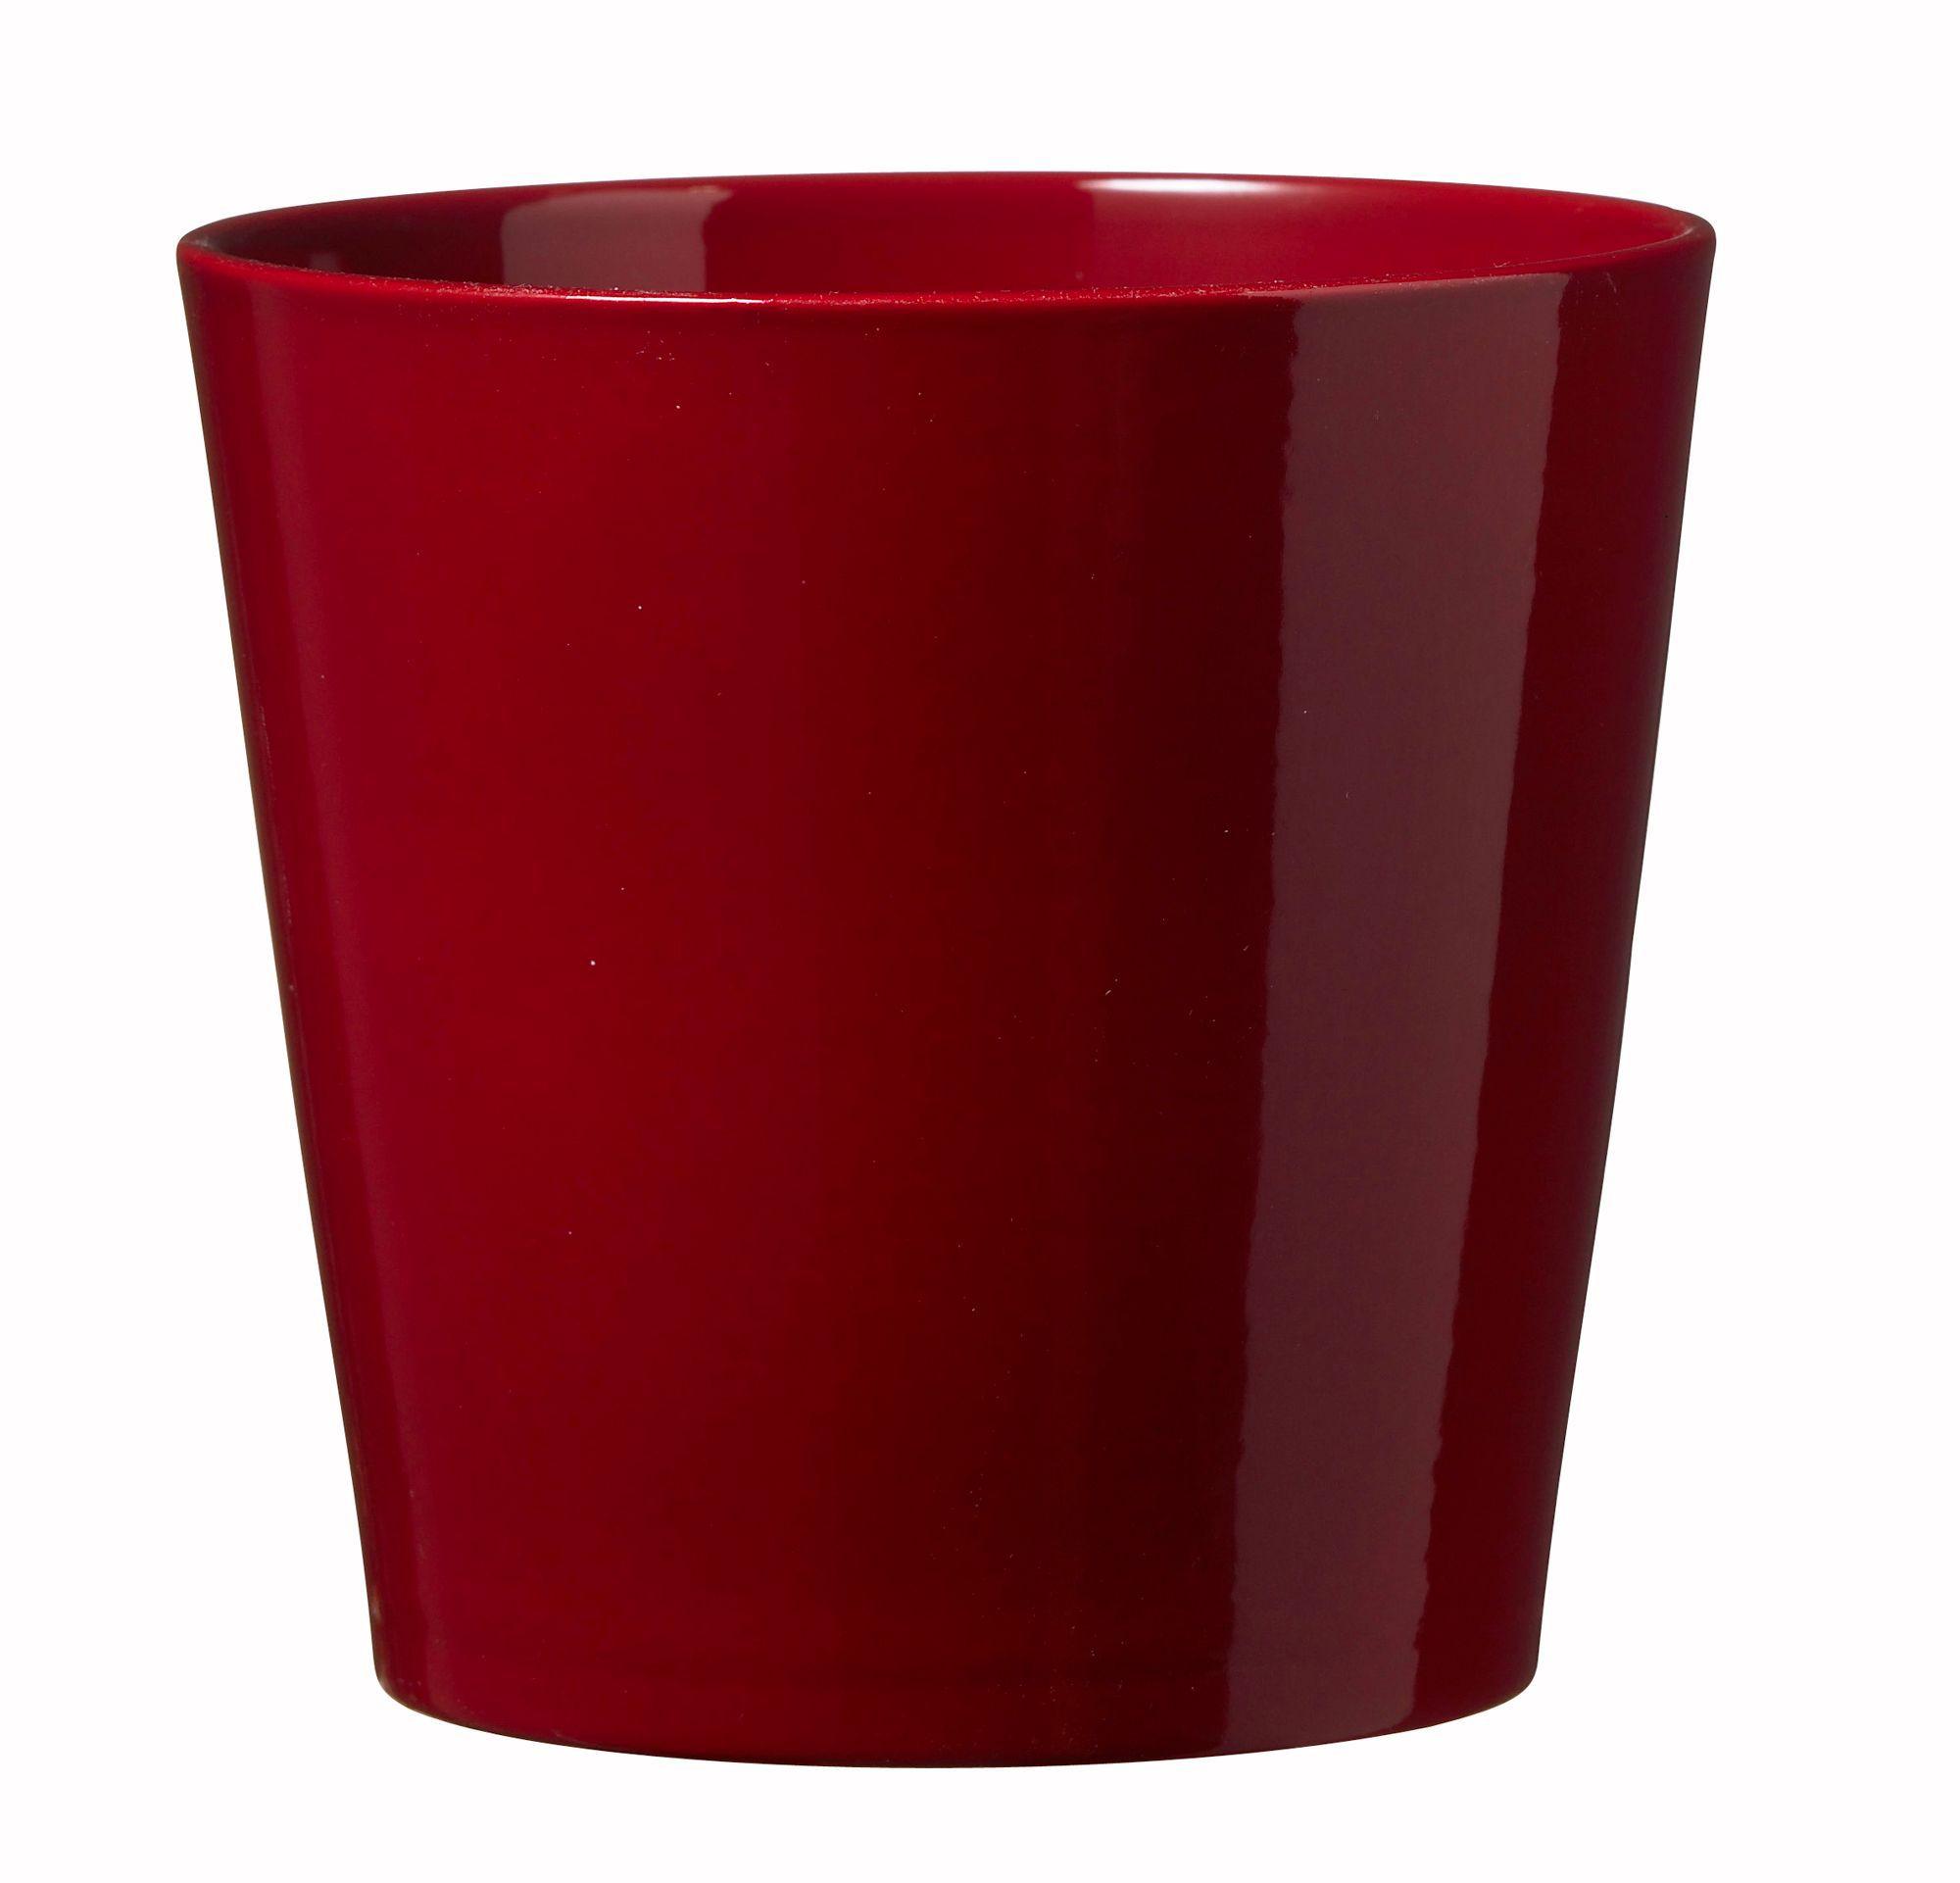 Dallas Glazed Red Gloss Plant Pot H 150mm Dia 160mm